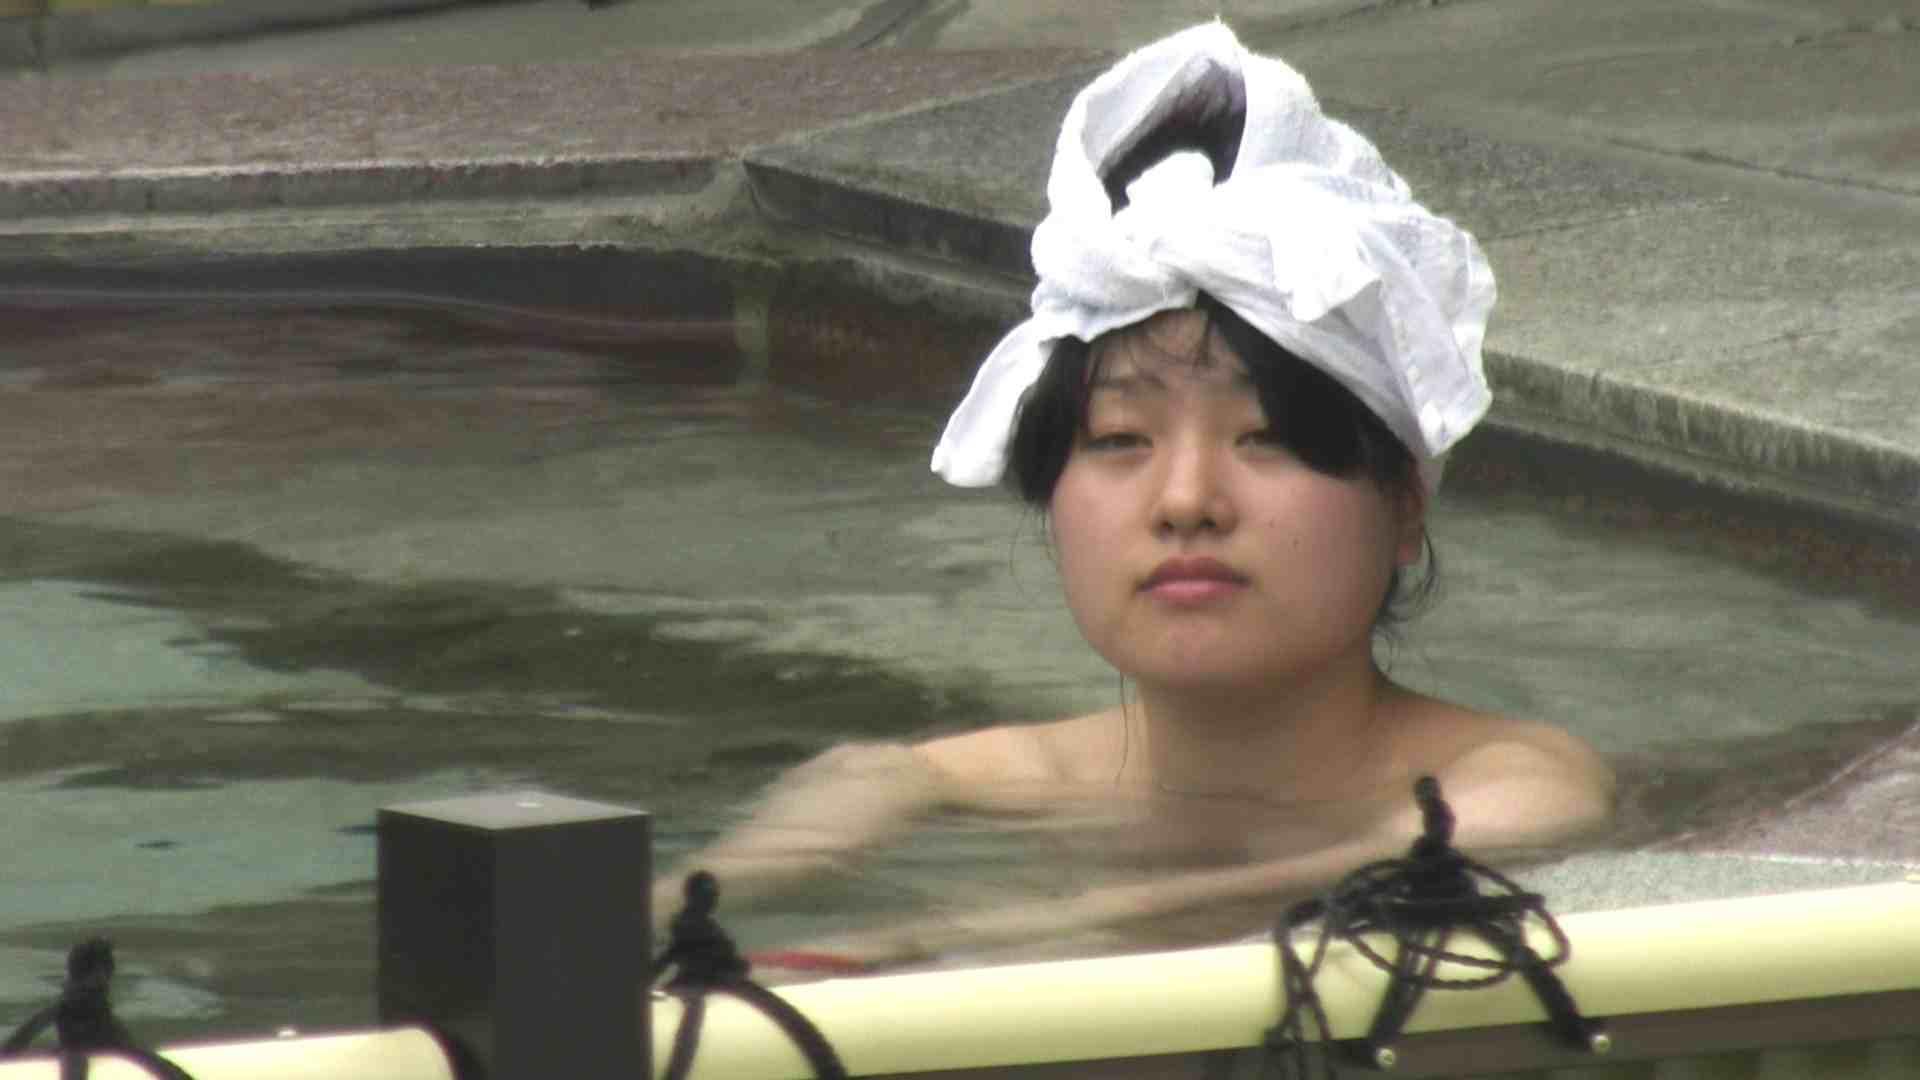 Aquaな露天風呂Vol.185 盗撮   HなOL  102pic 40